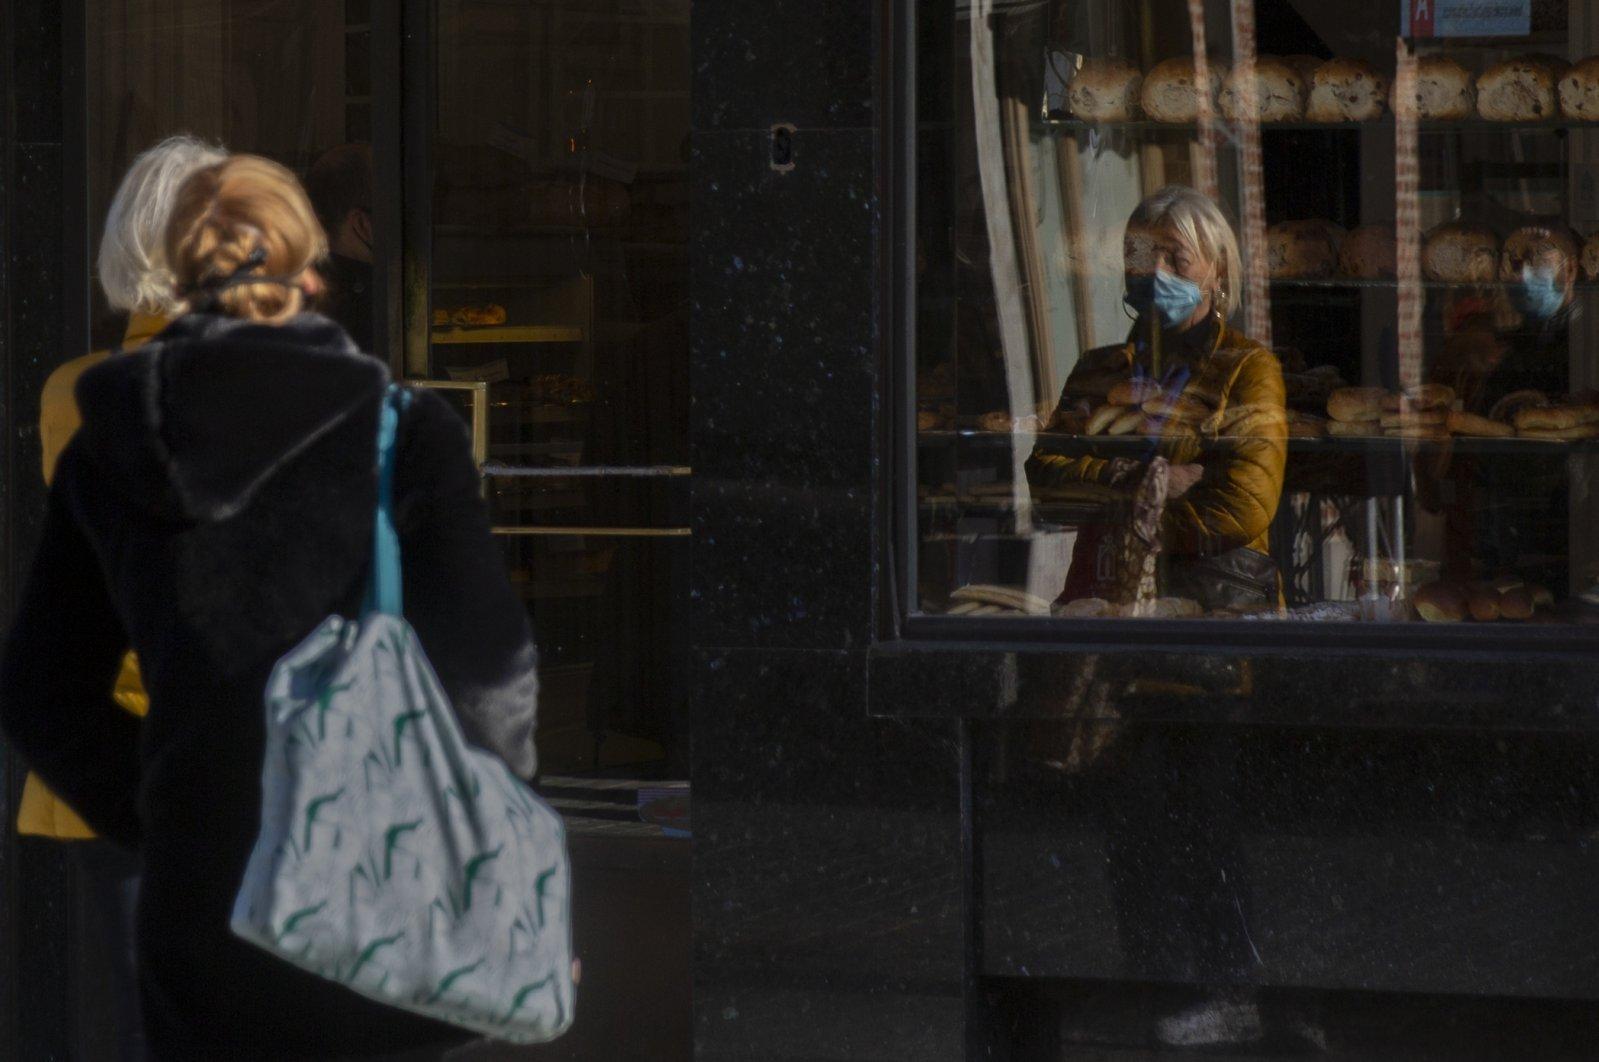 Two women wait in line at a bakery in Antwerp, Belgium, Nov. 4, 2020. (AP Photo)